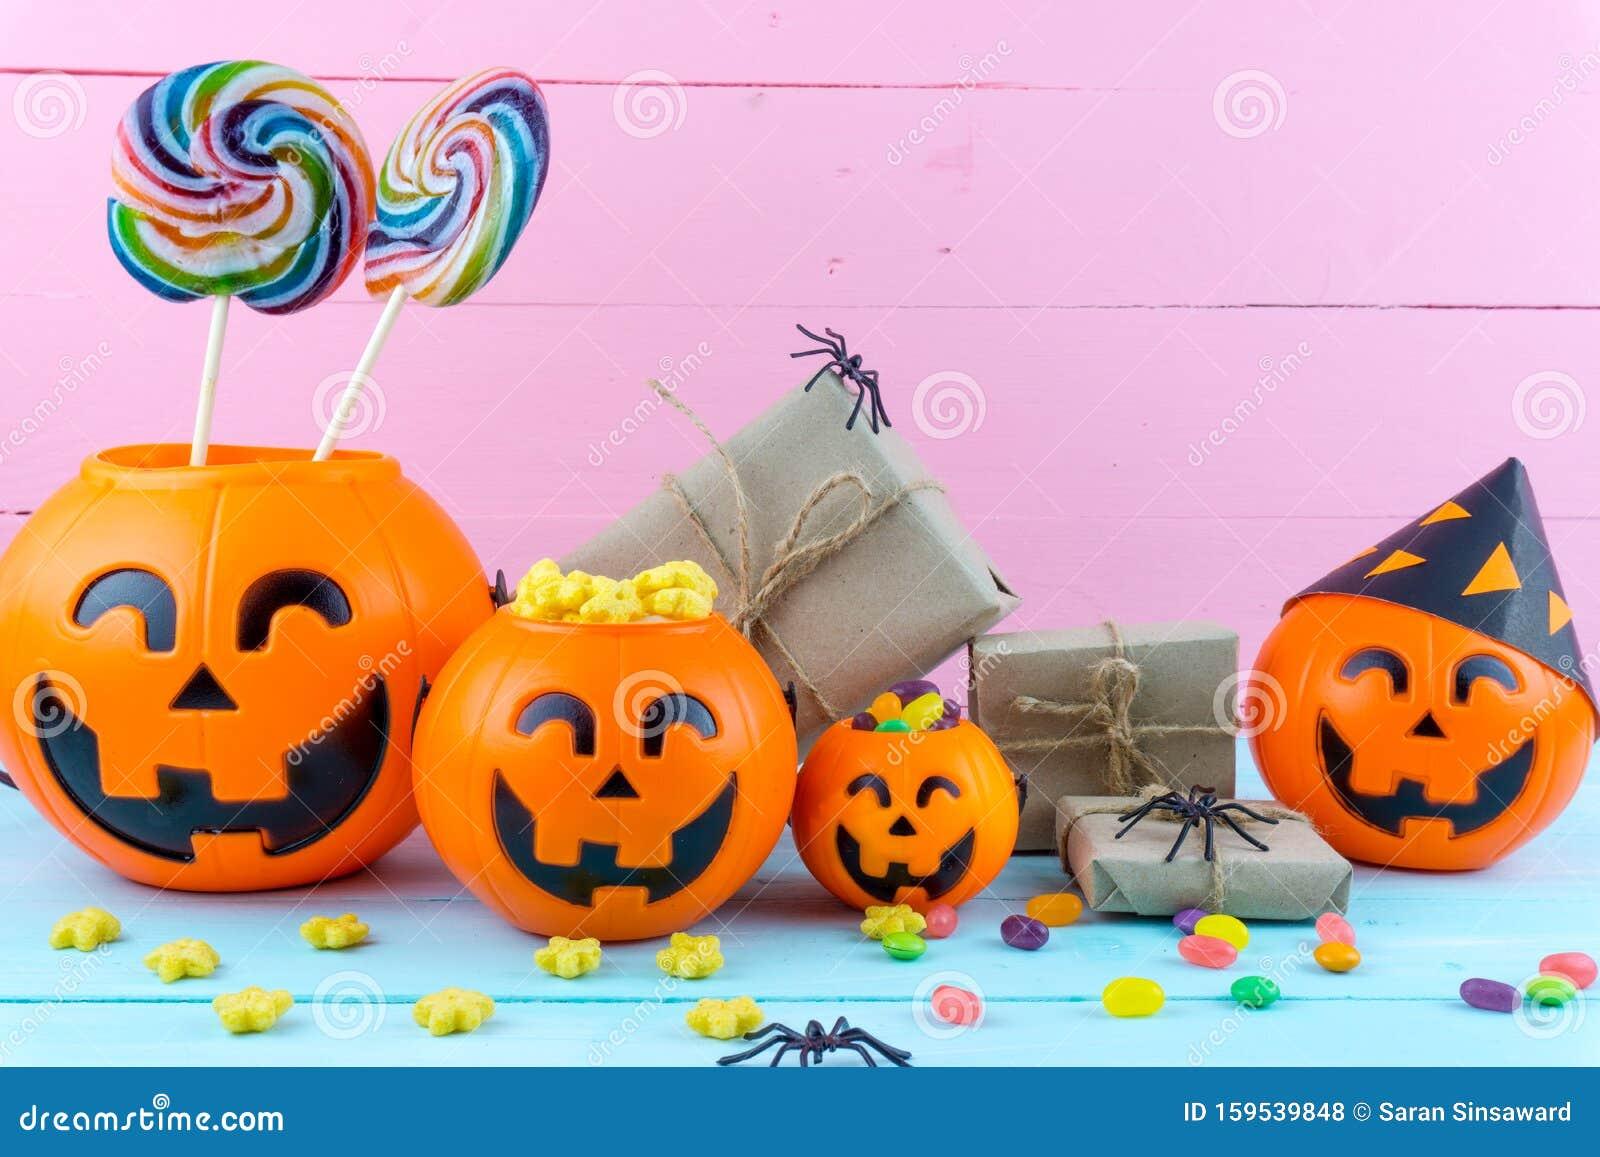 Halloween Jack O Lantern Candy Bucket Blue